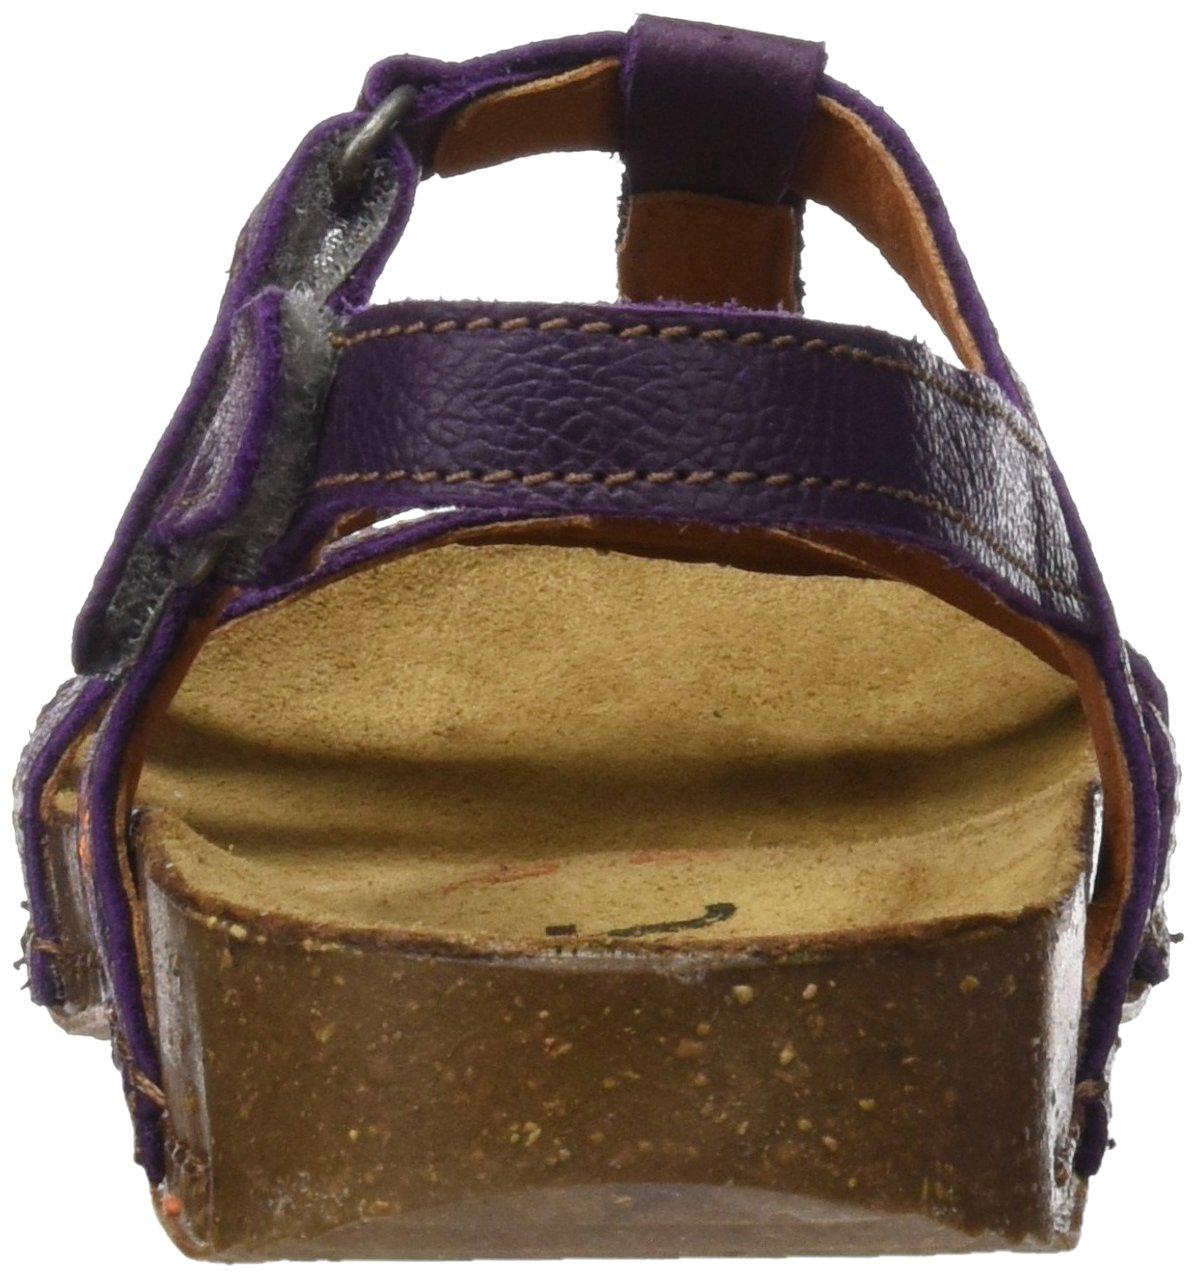 ART Damen 0946 Memphis I Breathe (Cerise) Sandalen mit Knöchelriemen Violett (Cerise) Breathe a449a4